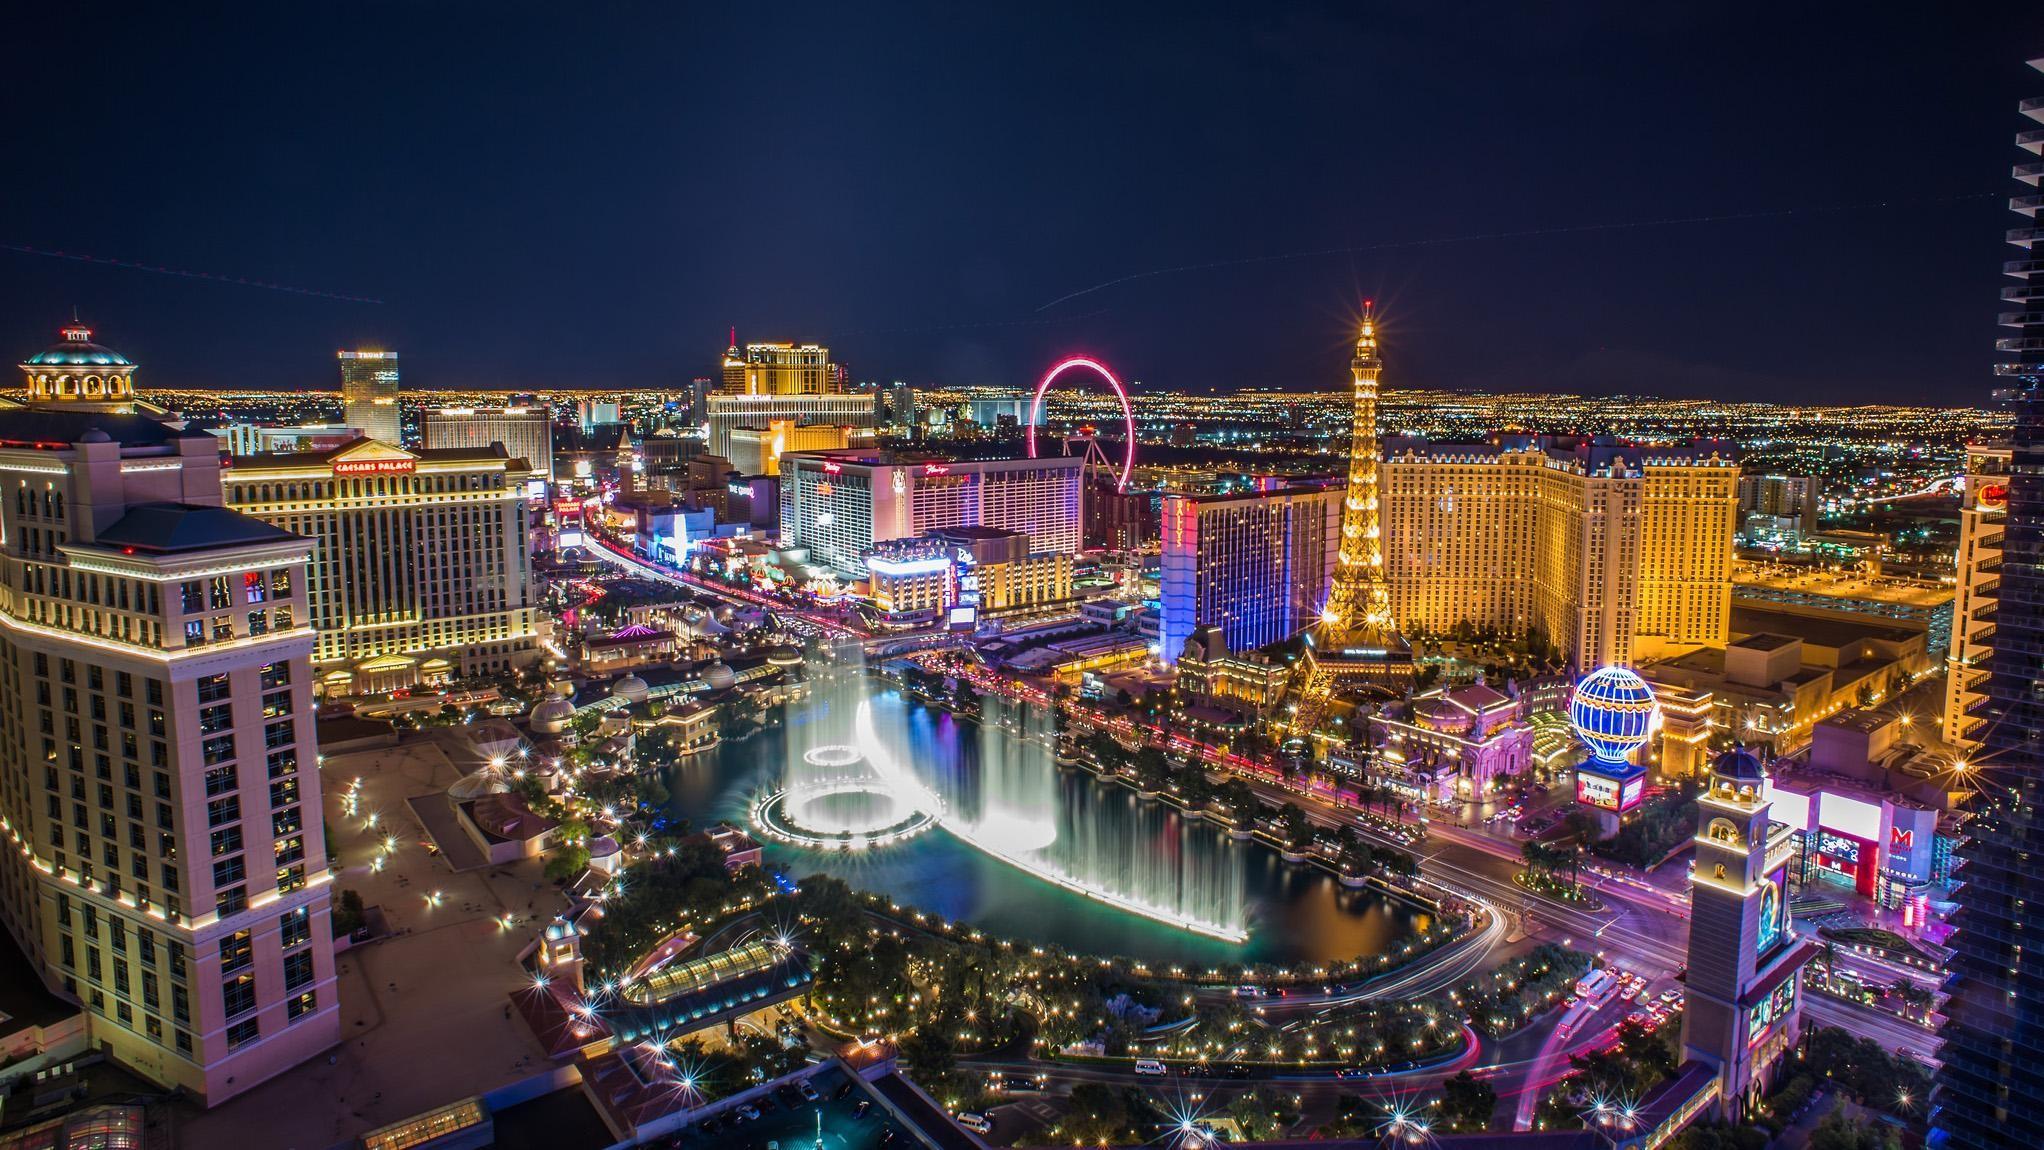 Las Vegas Wallpaper 183 ① Download Free Beautiful Hd